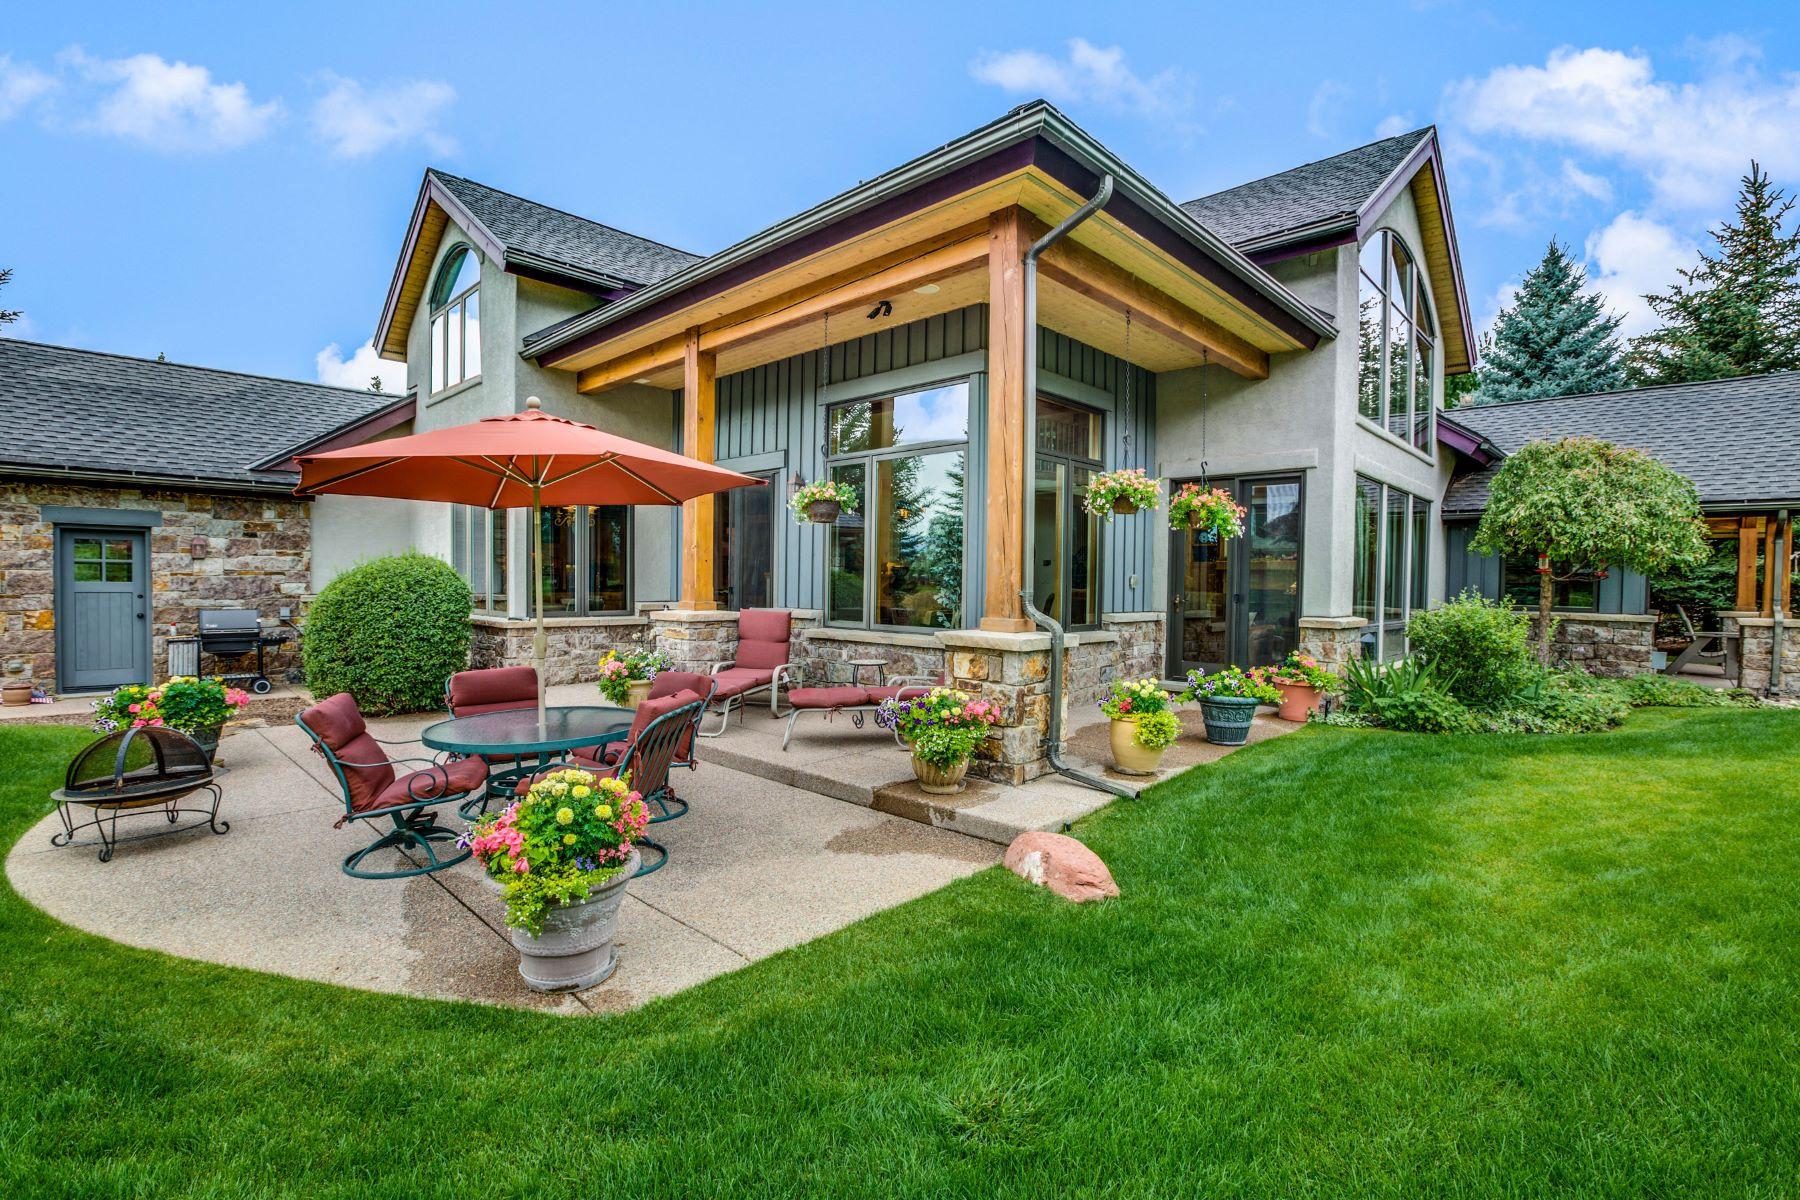 独户住宅 为 销售 在 Charming Mountain Home with Fairway Views 118 Kingfisher Lane, 卡本代尔, 科罗拉多州, 81623 美国